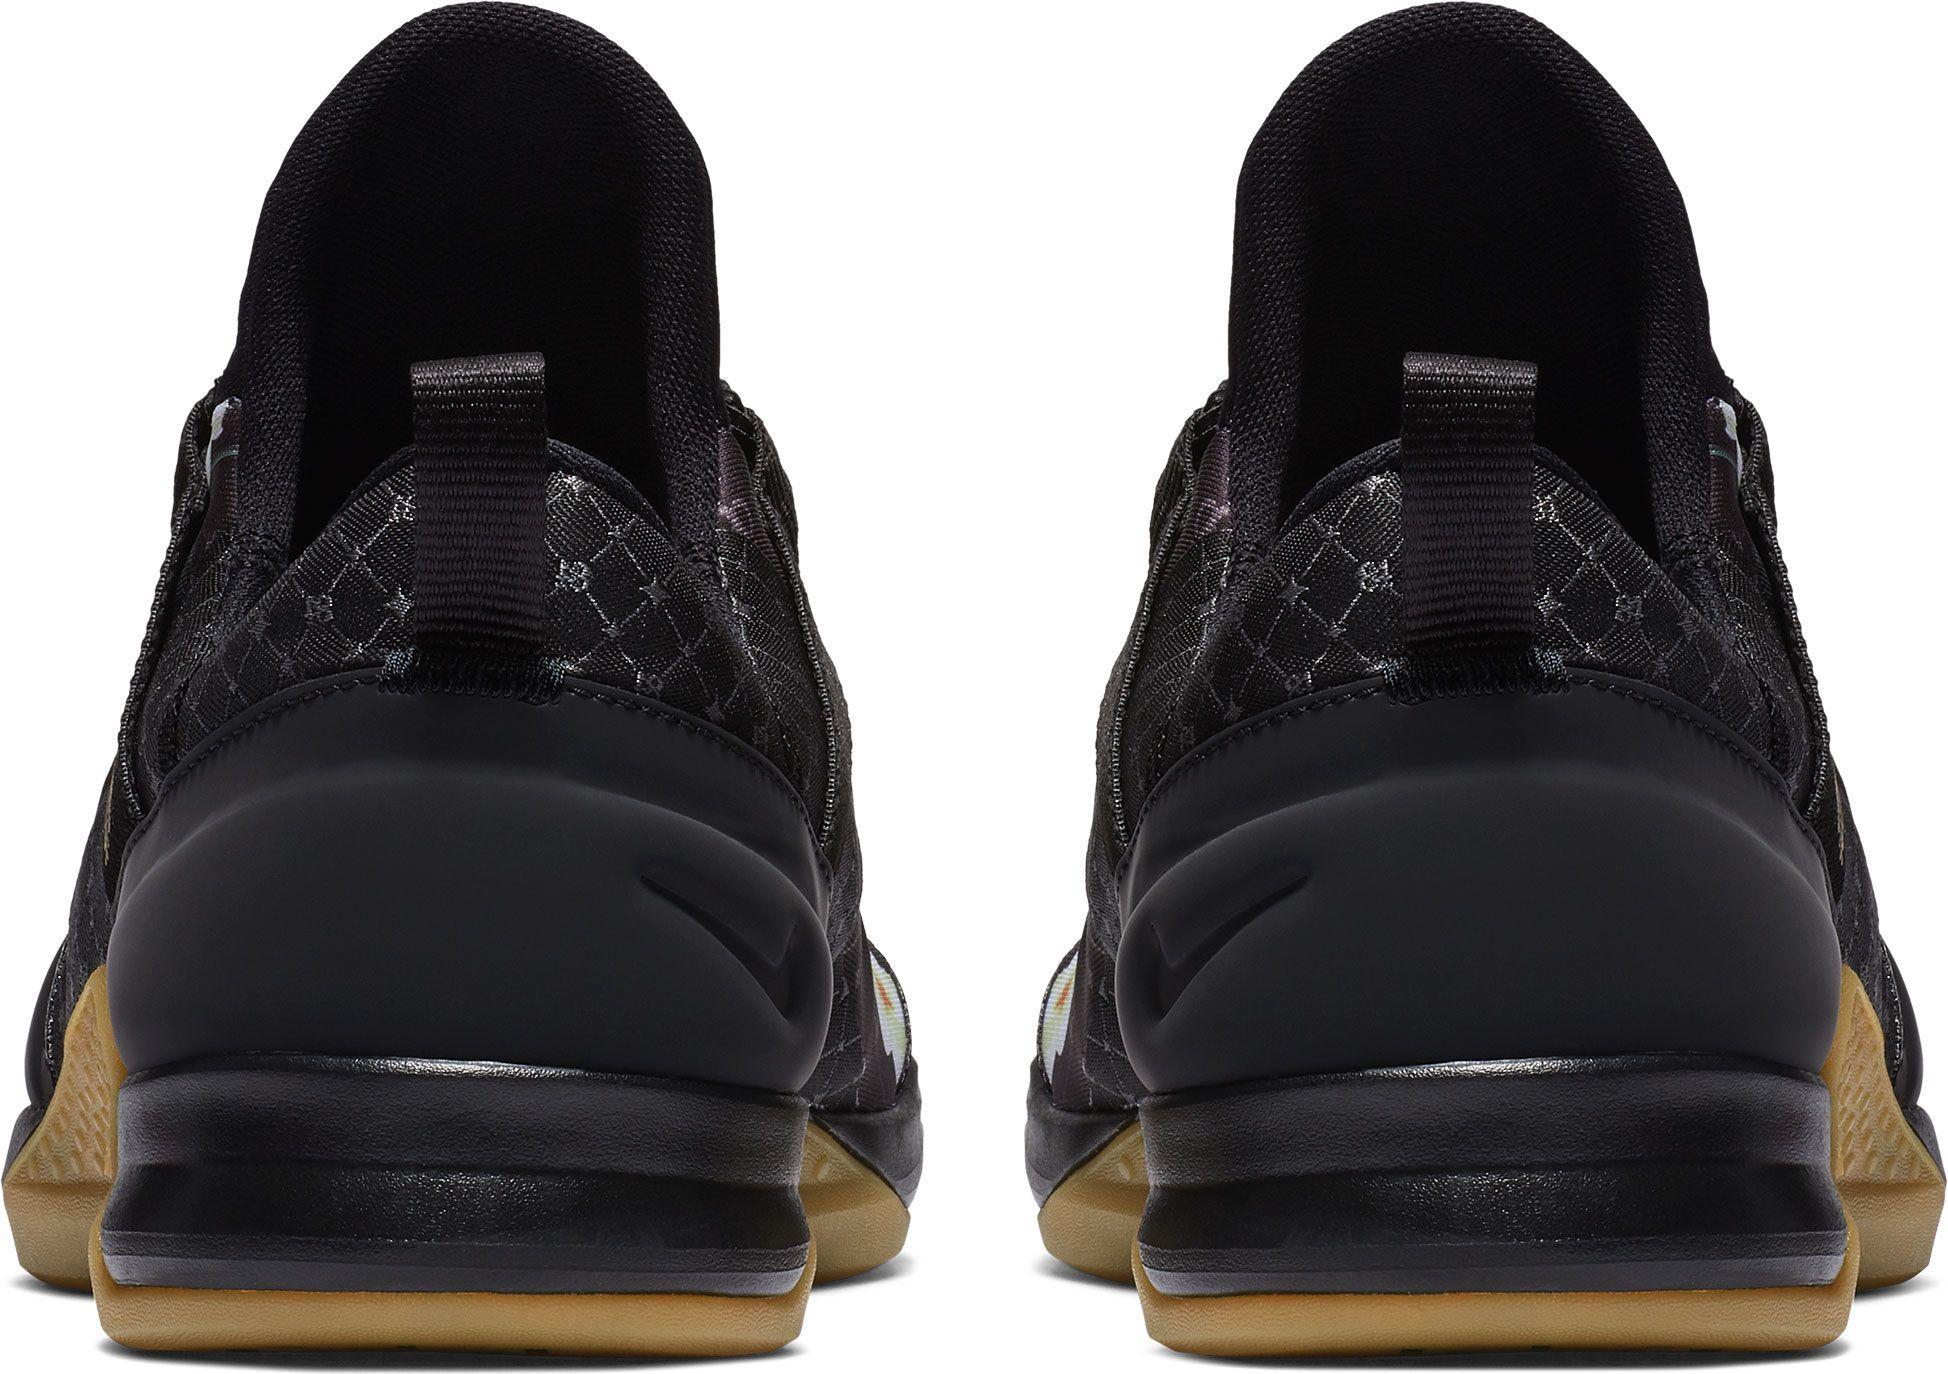 inteligente Resaltar Ciencias  Nike Rubber Tech Trainer Antonio Brown Shoes in Light Bone/Black/Gold  (Black) for Men - Lyst